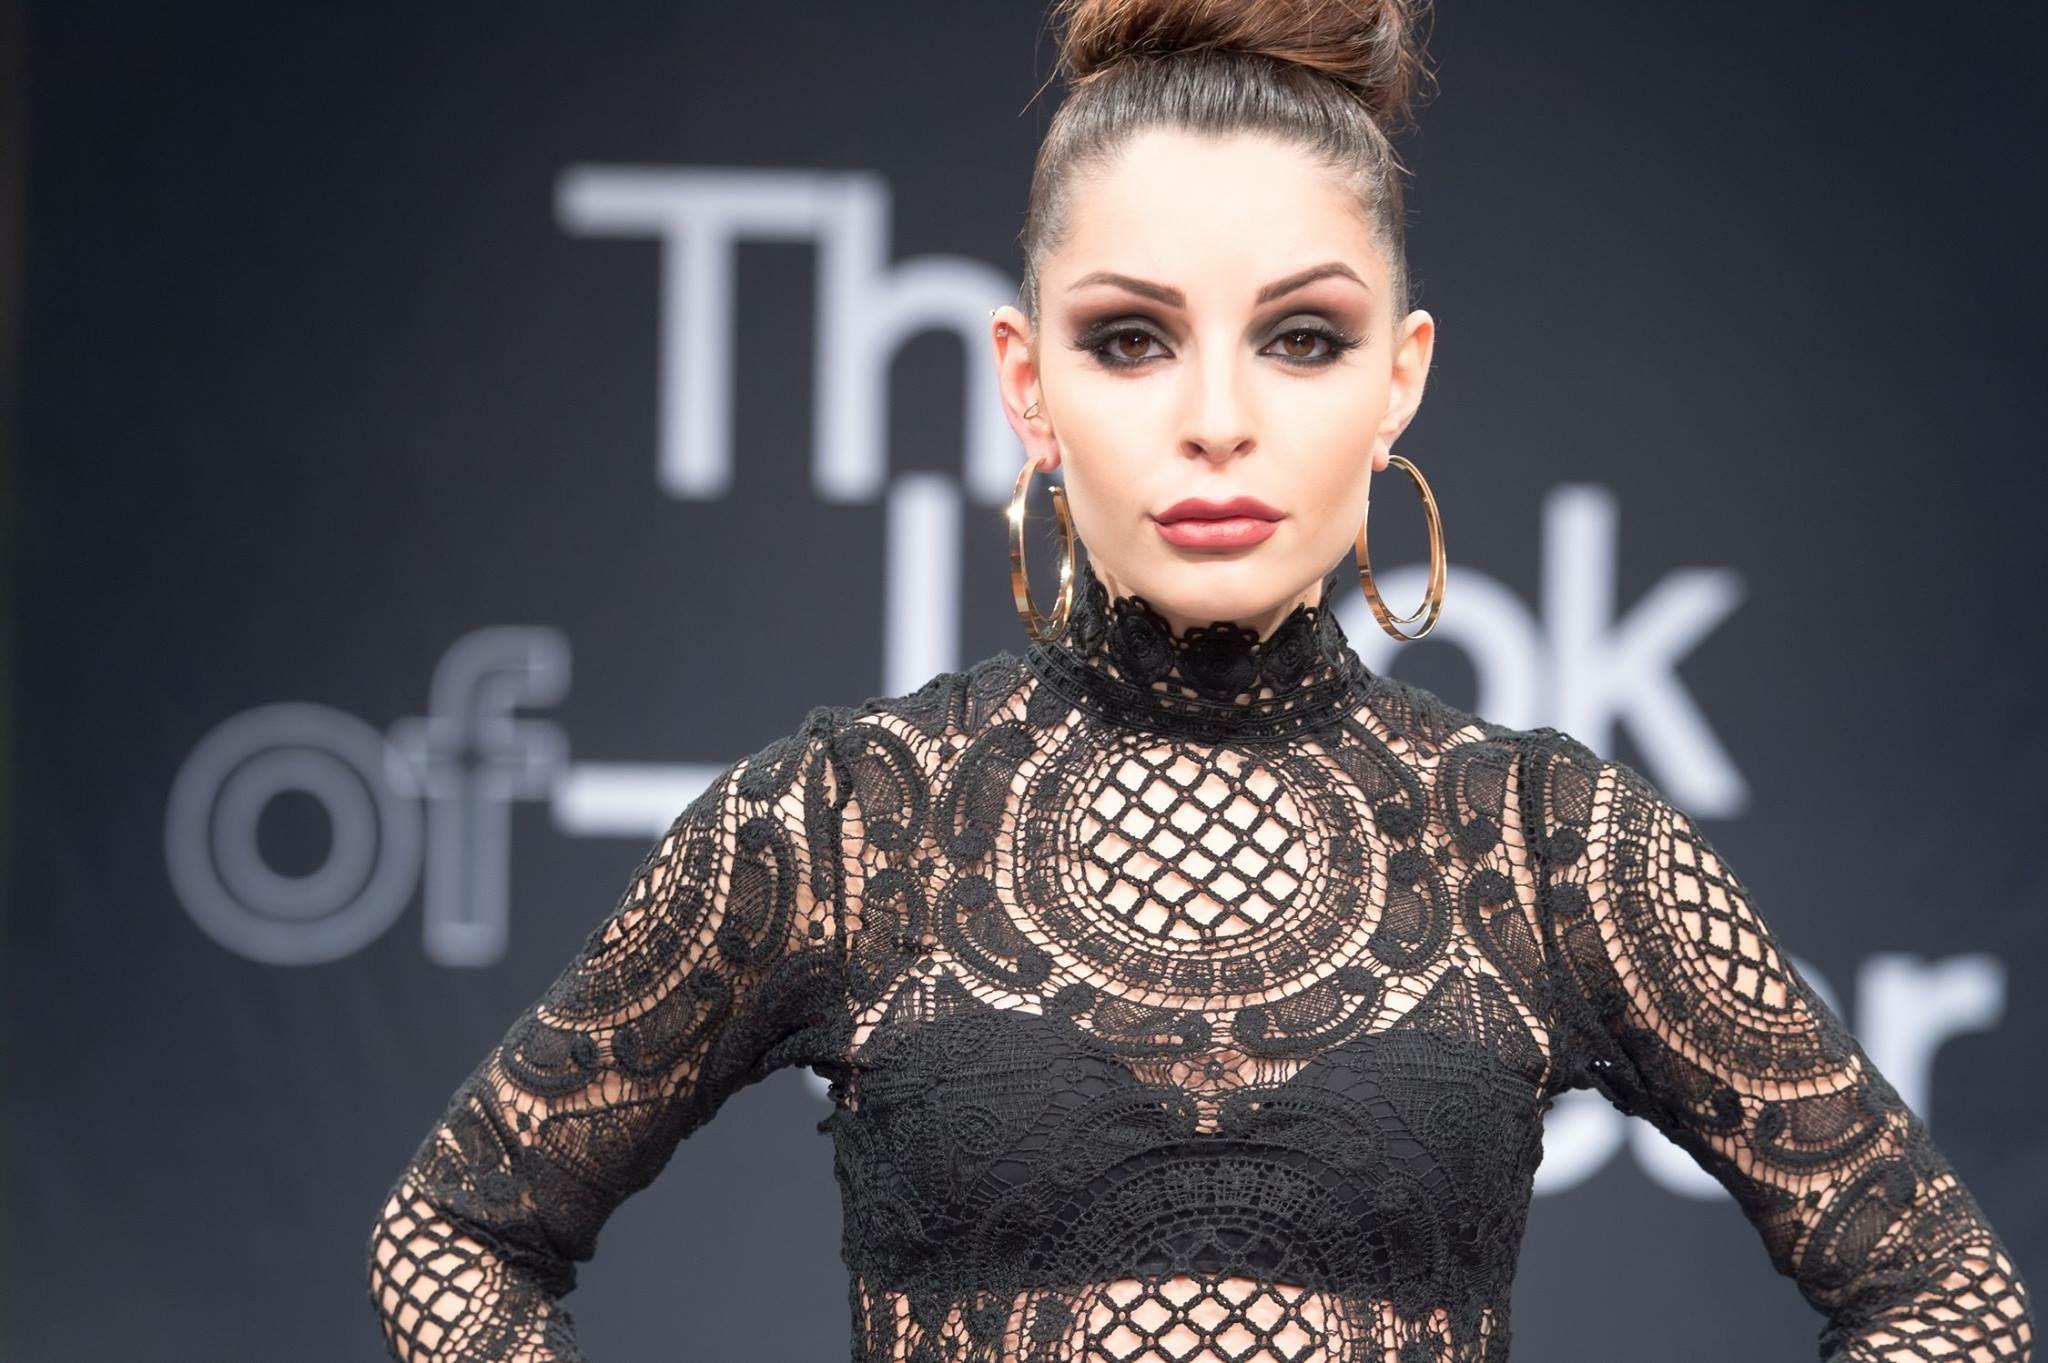 THE LOOK OF THE YEAR - Fashion and Models - Altaroma - Gaia Di Mauro ( Galypse ) - #blogger #fashionblogger